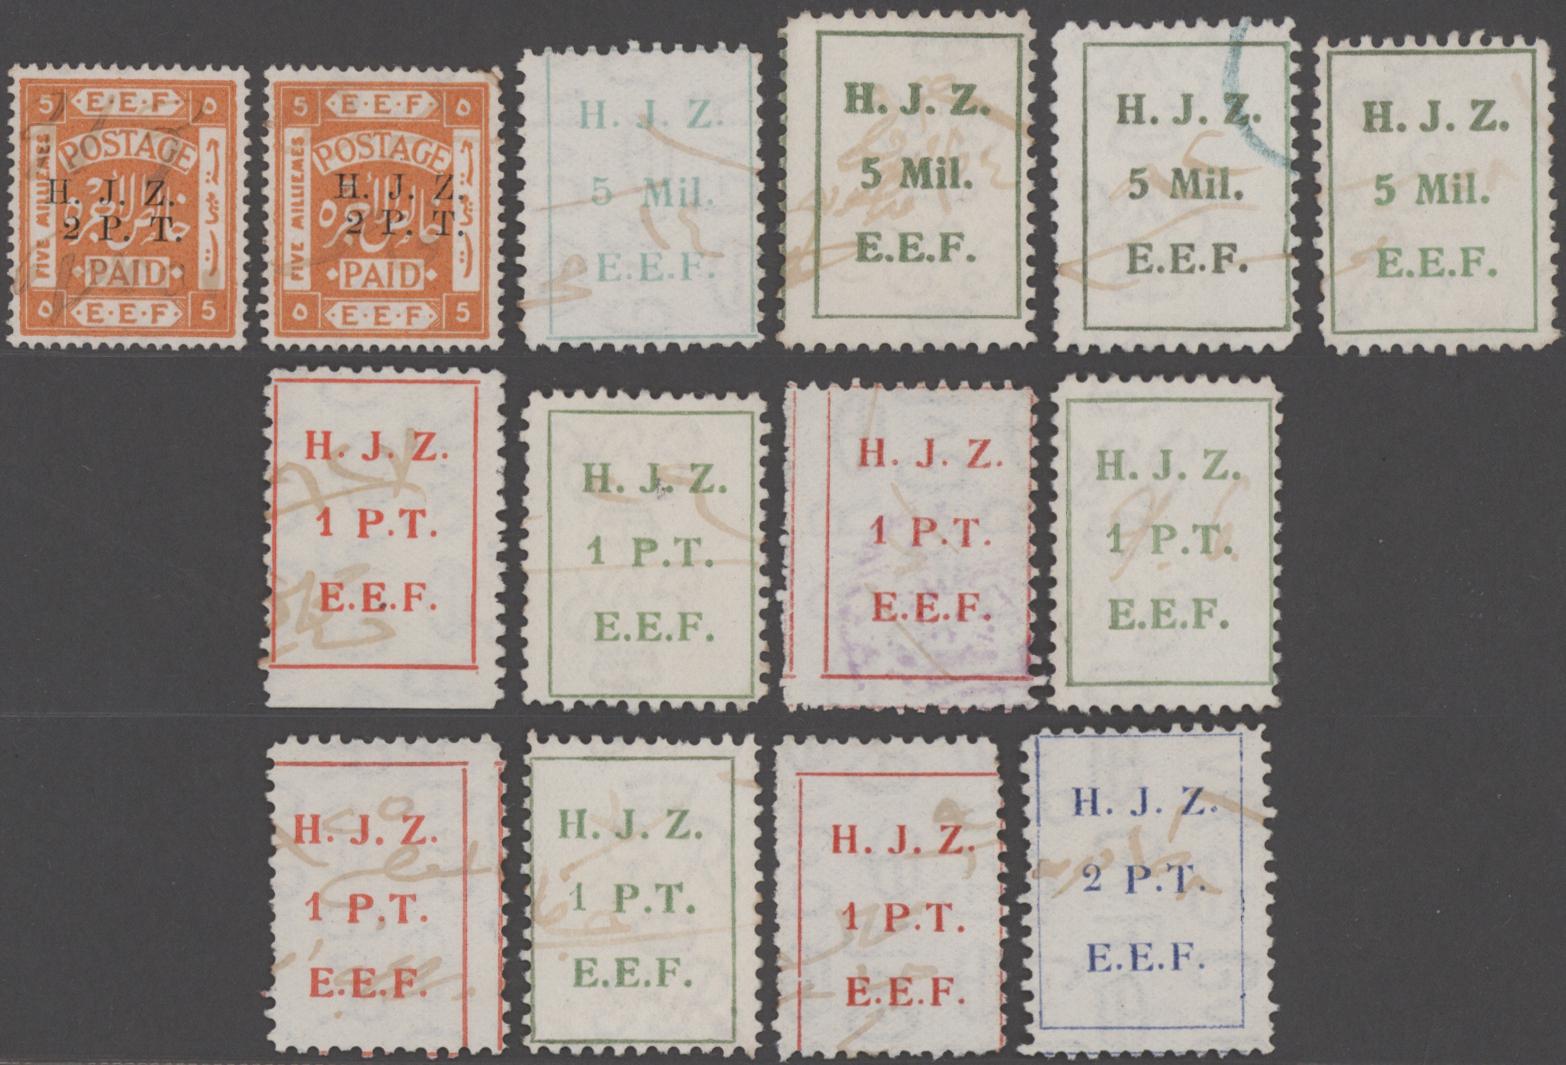 Lot 17191 - palästina  -  Auktionshaus Christoph Gärtner GmbH & Co. KG Sale #49 Collections Overseas, Thematics, Europe, Germany/Estates